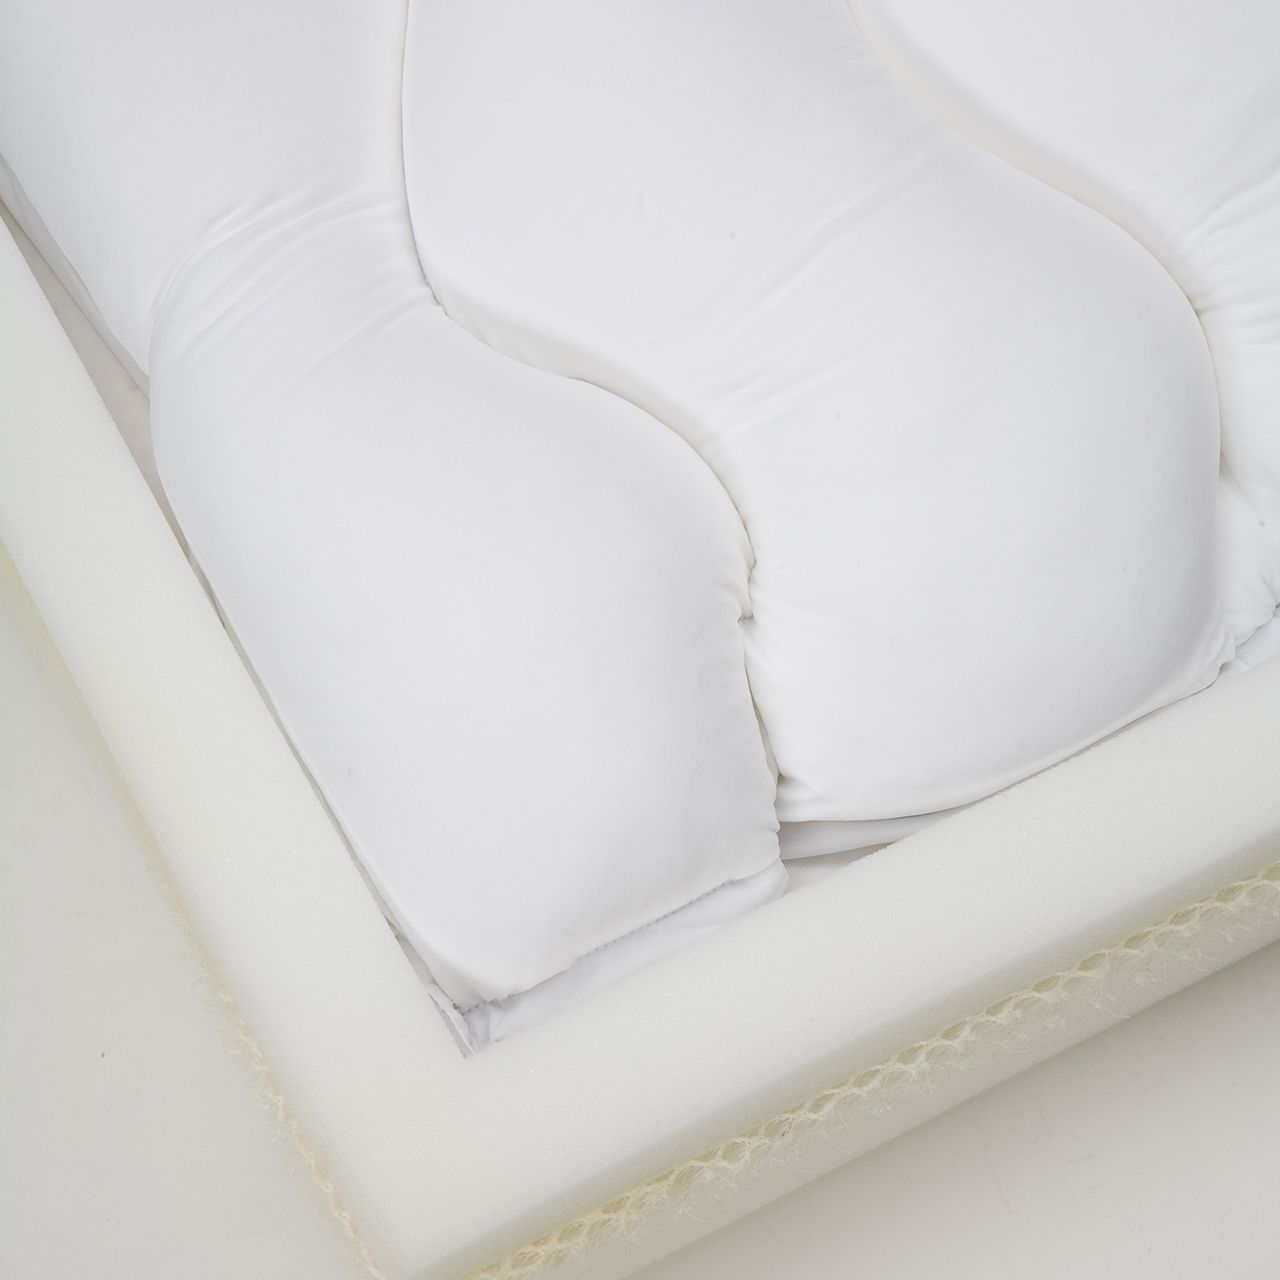 isuromed matrassen detail